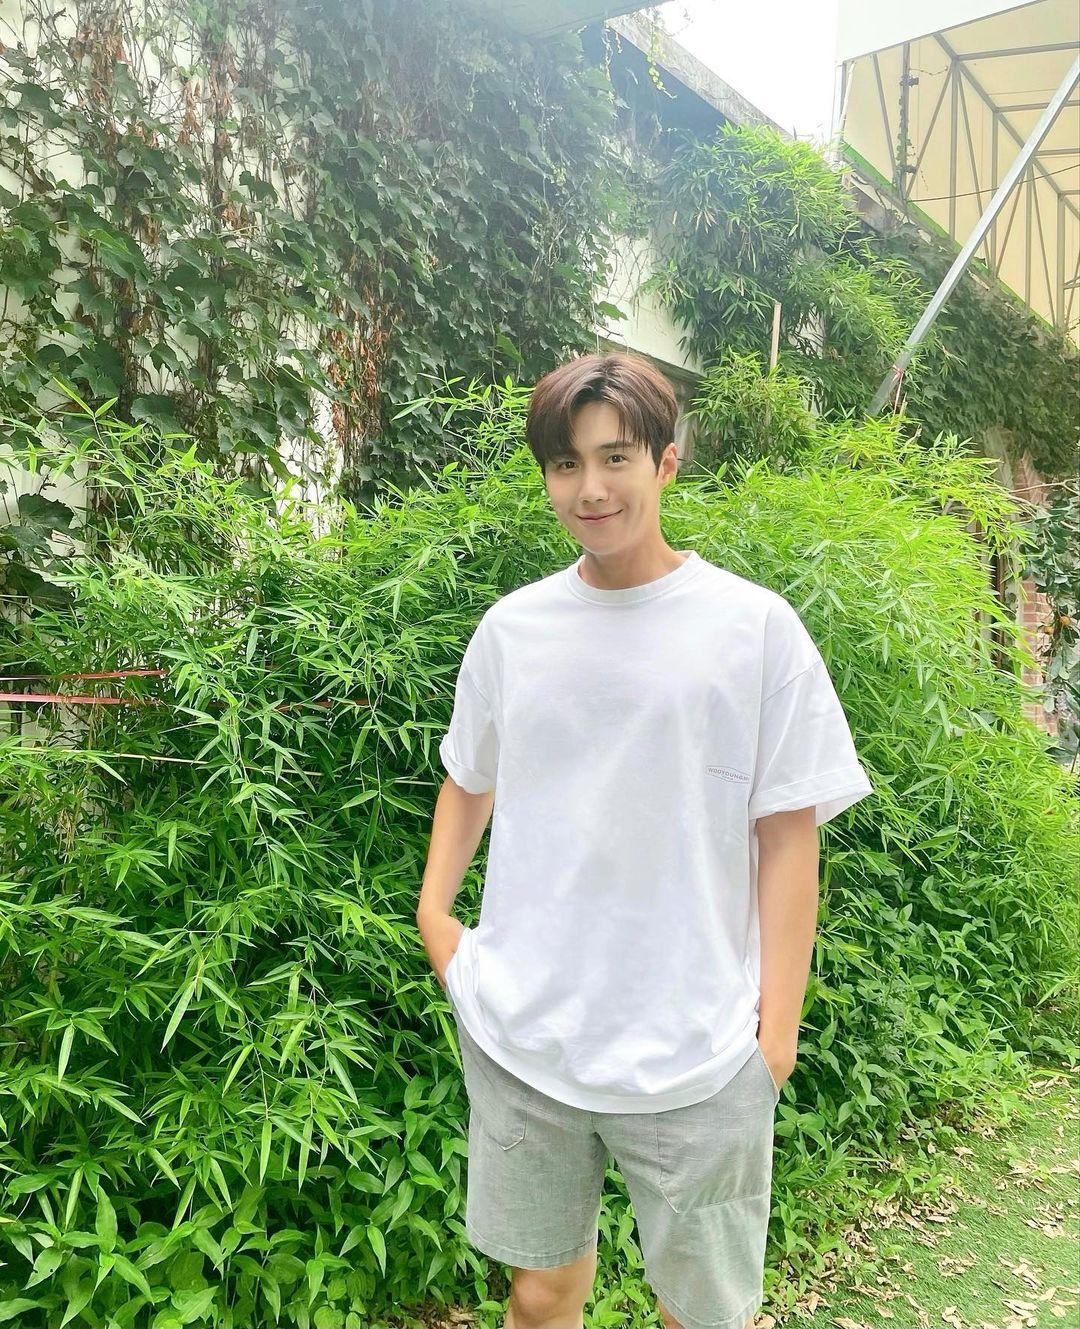 Korean actors and their childhood dreams: Kim Seon Ho